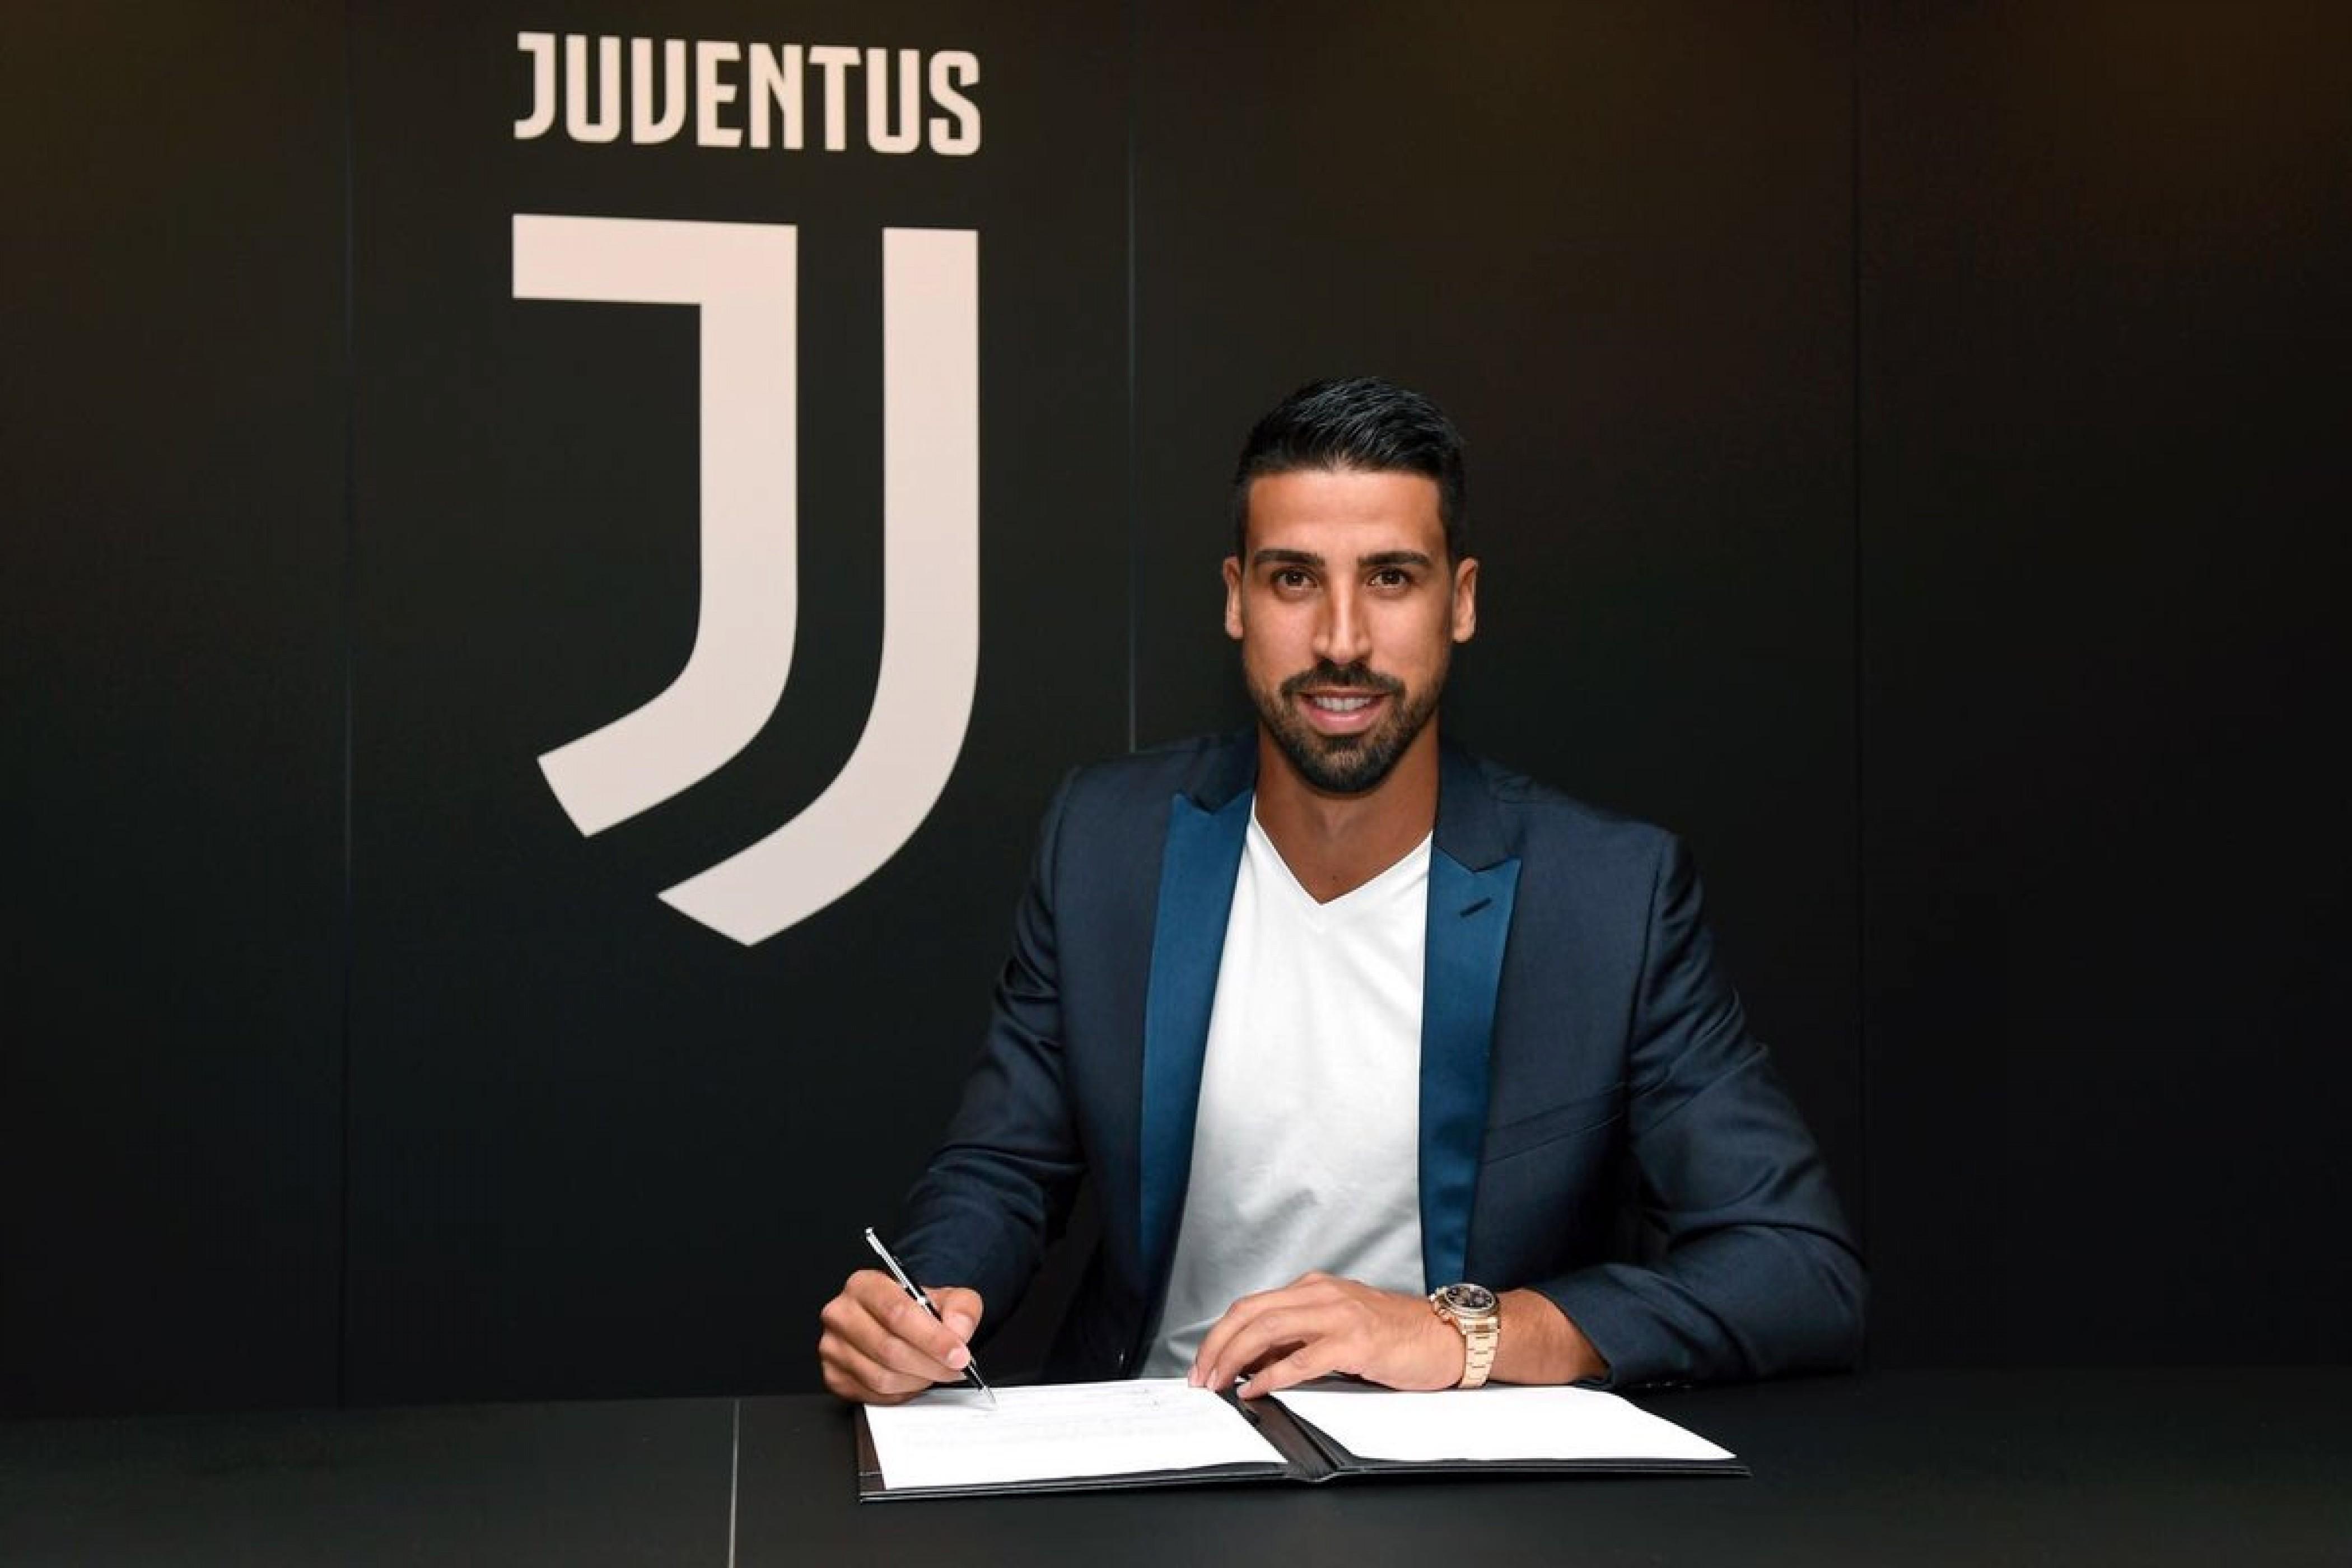 Juventus - Le ultime del campo, rinnova Khedira